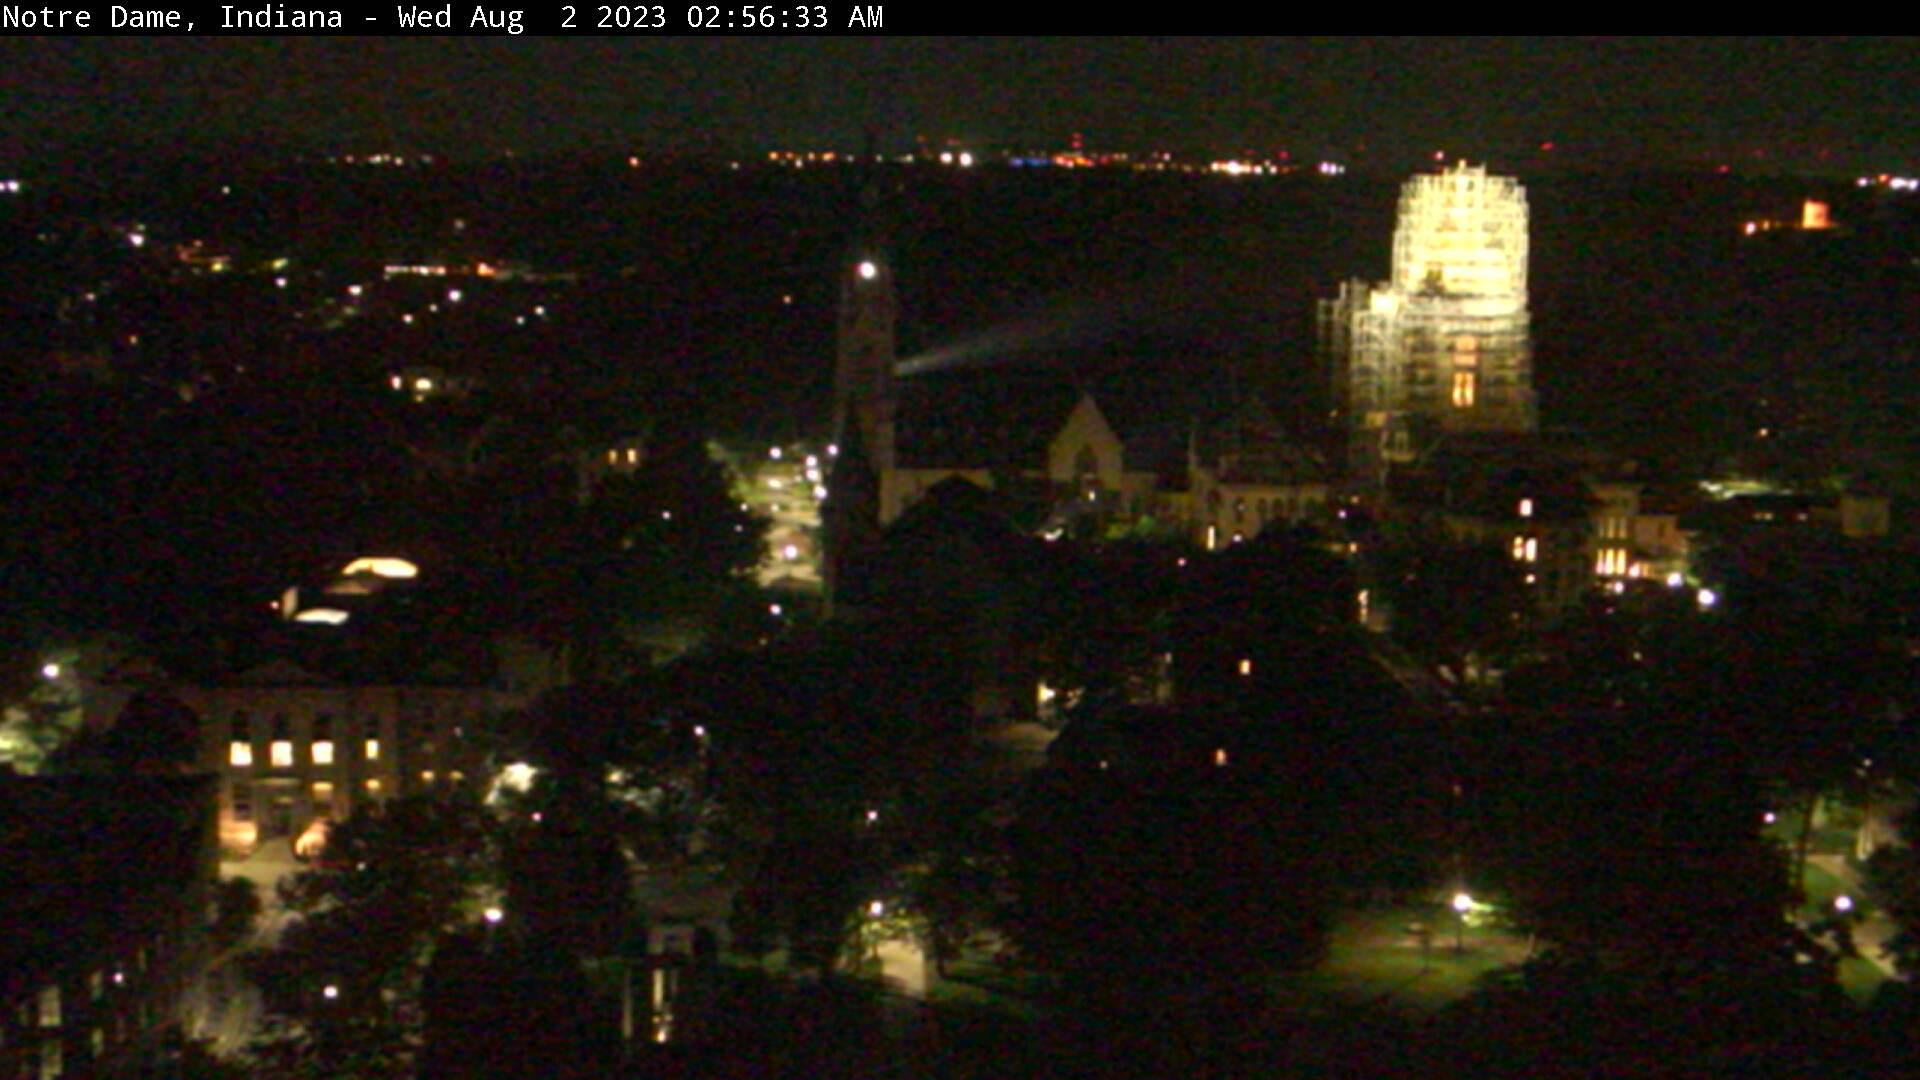 Notre Dame, Indiana Sat. 02:56